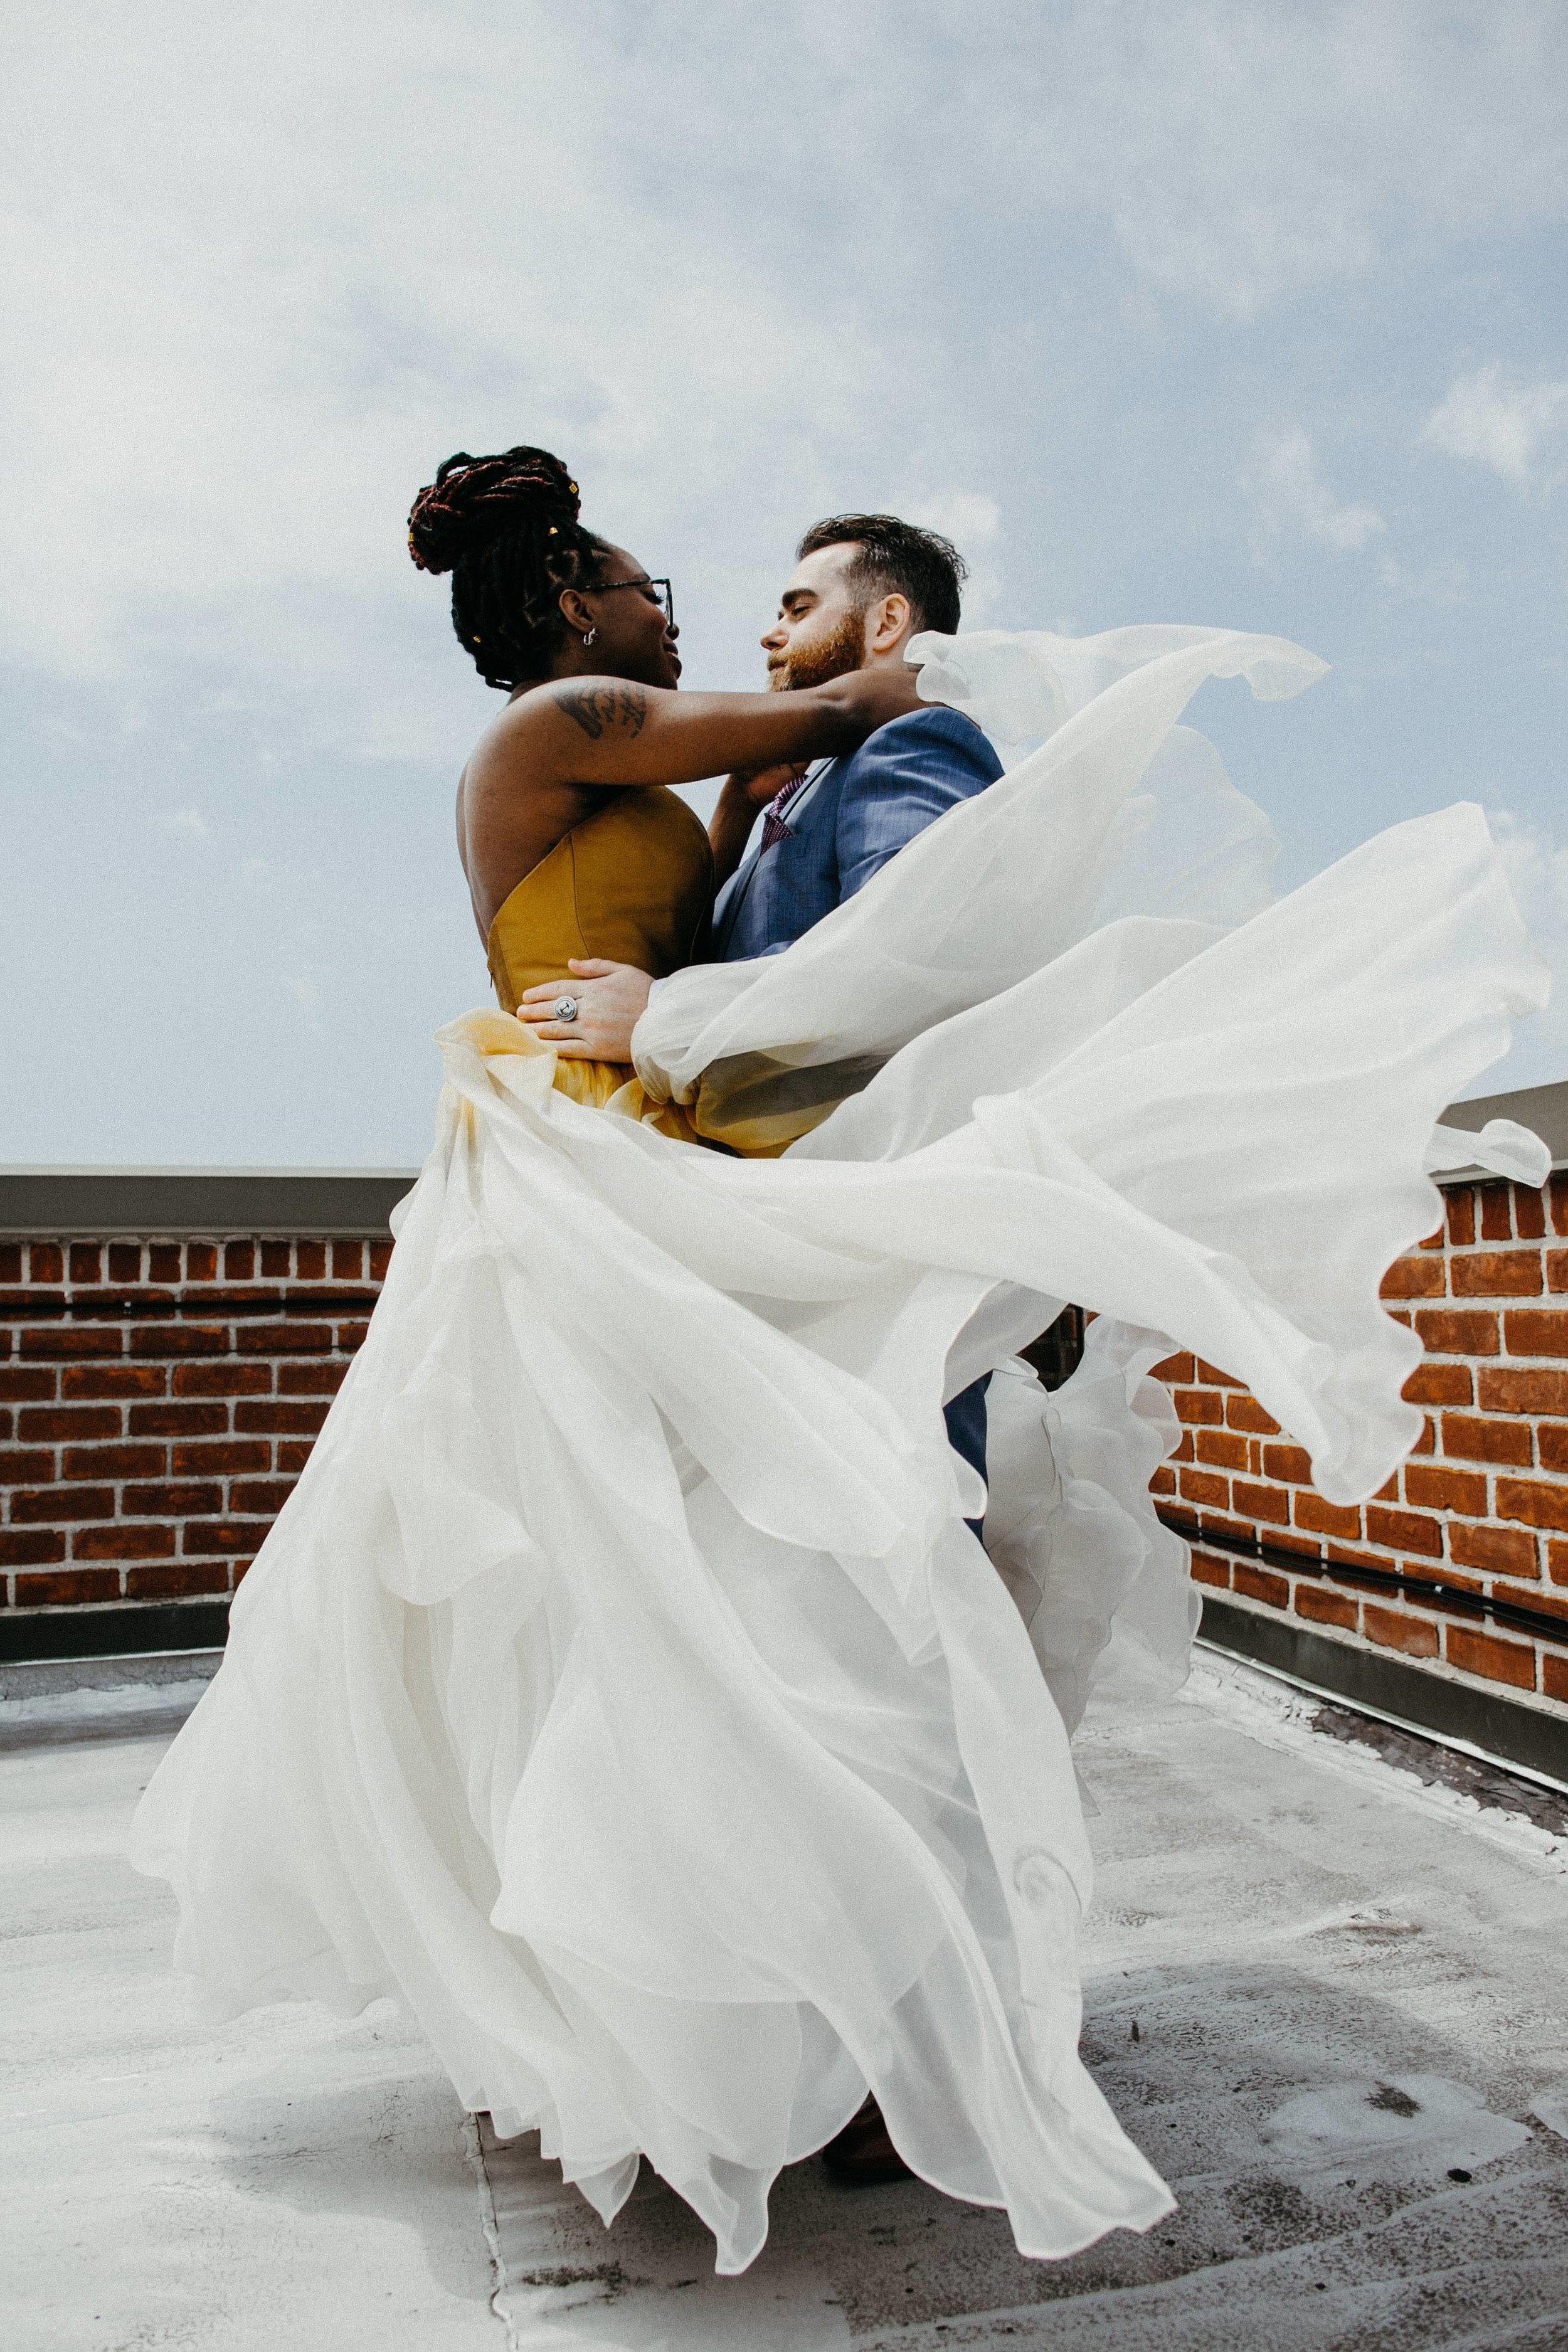 Sevlynn-Photography-Wedding-LIC-Landing-Maiella-NYC-3.jpg